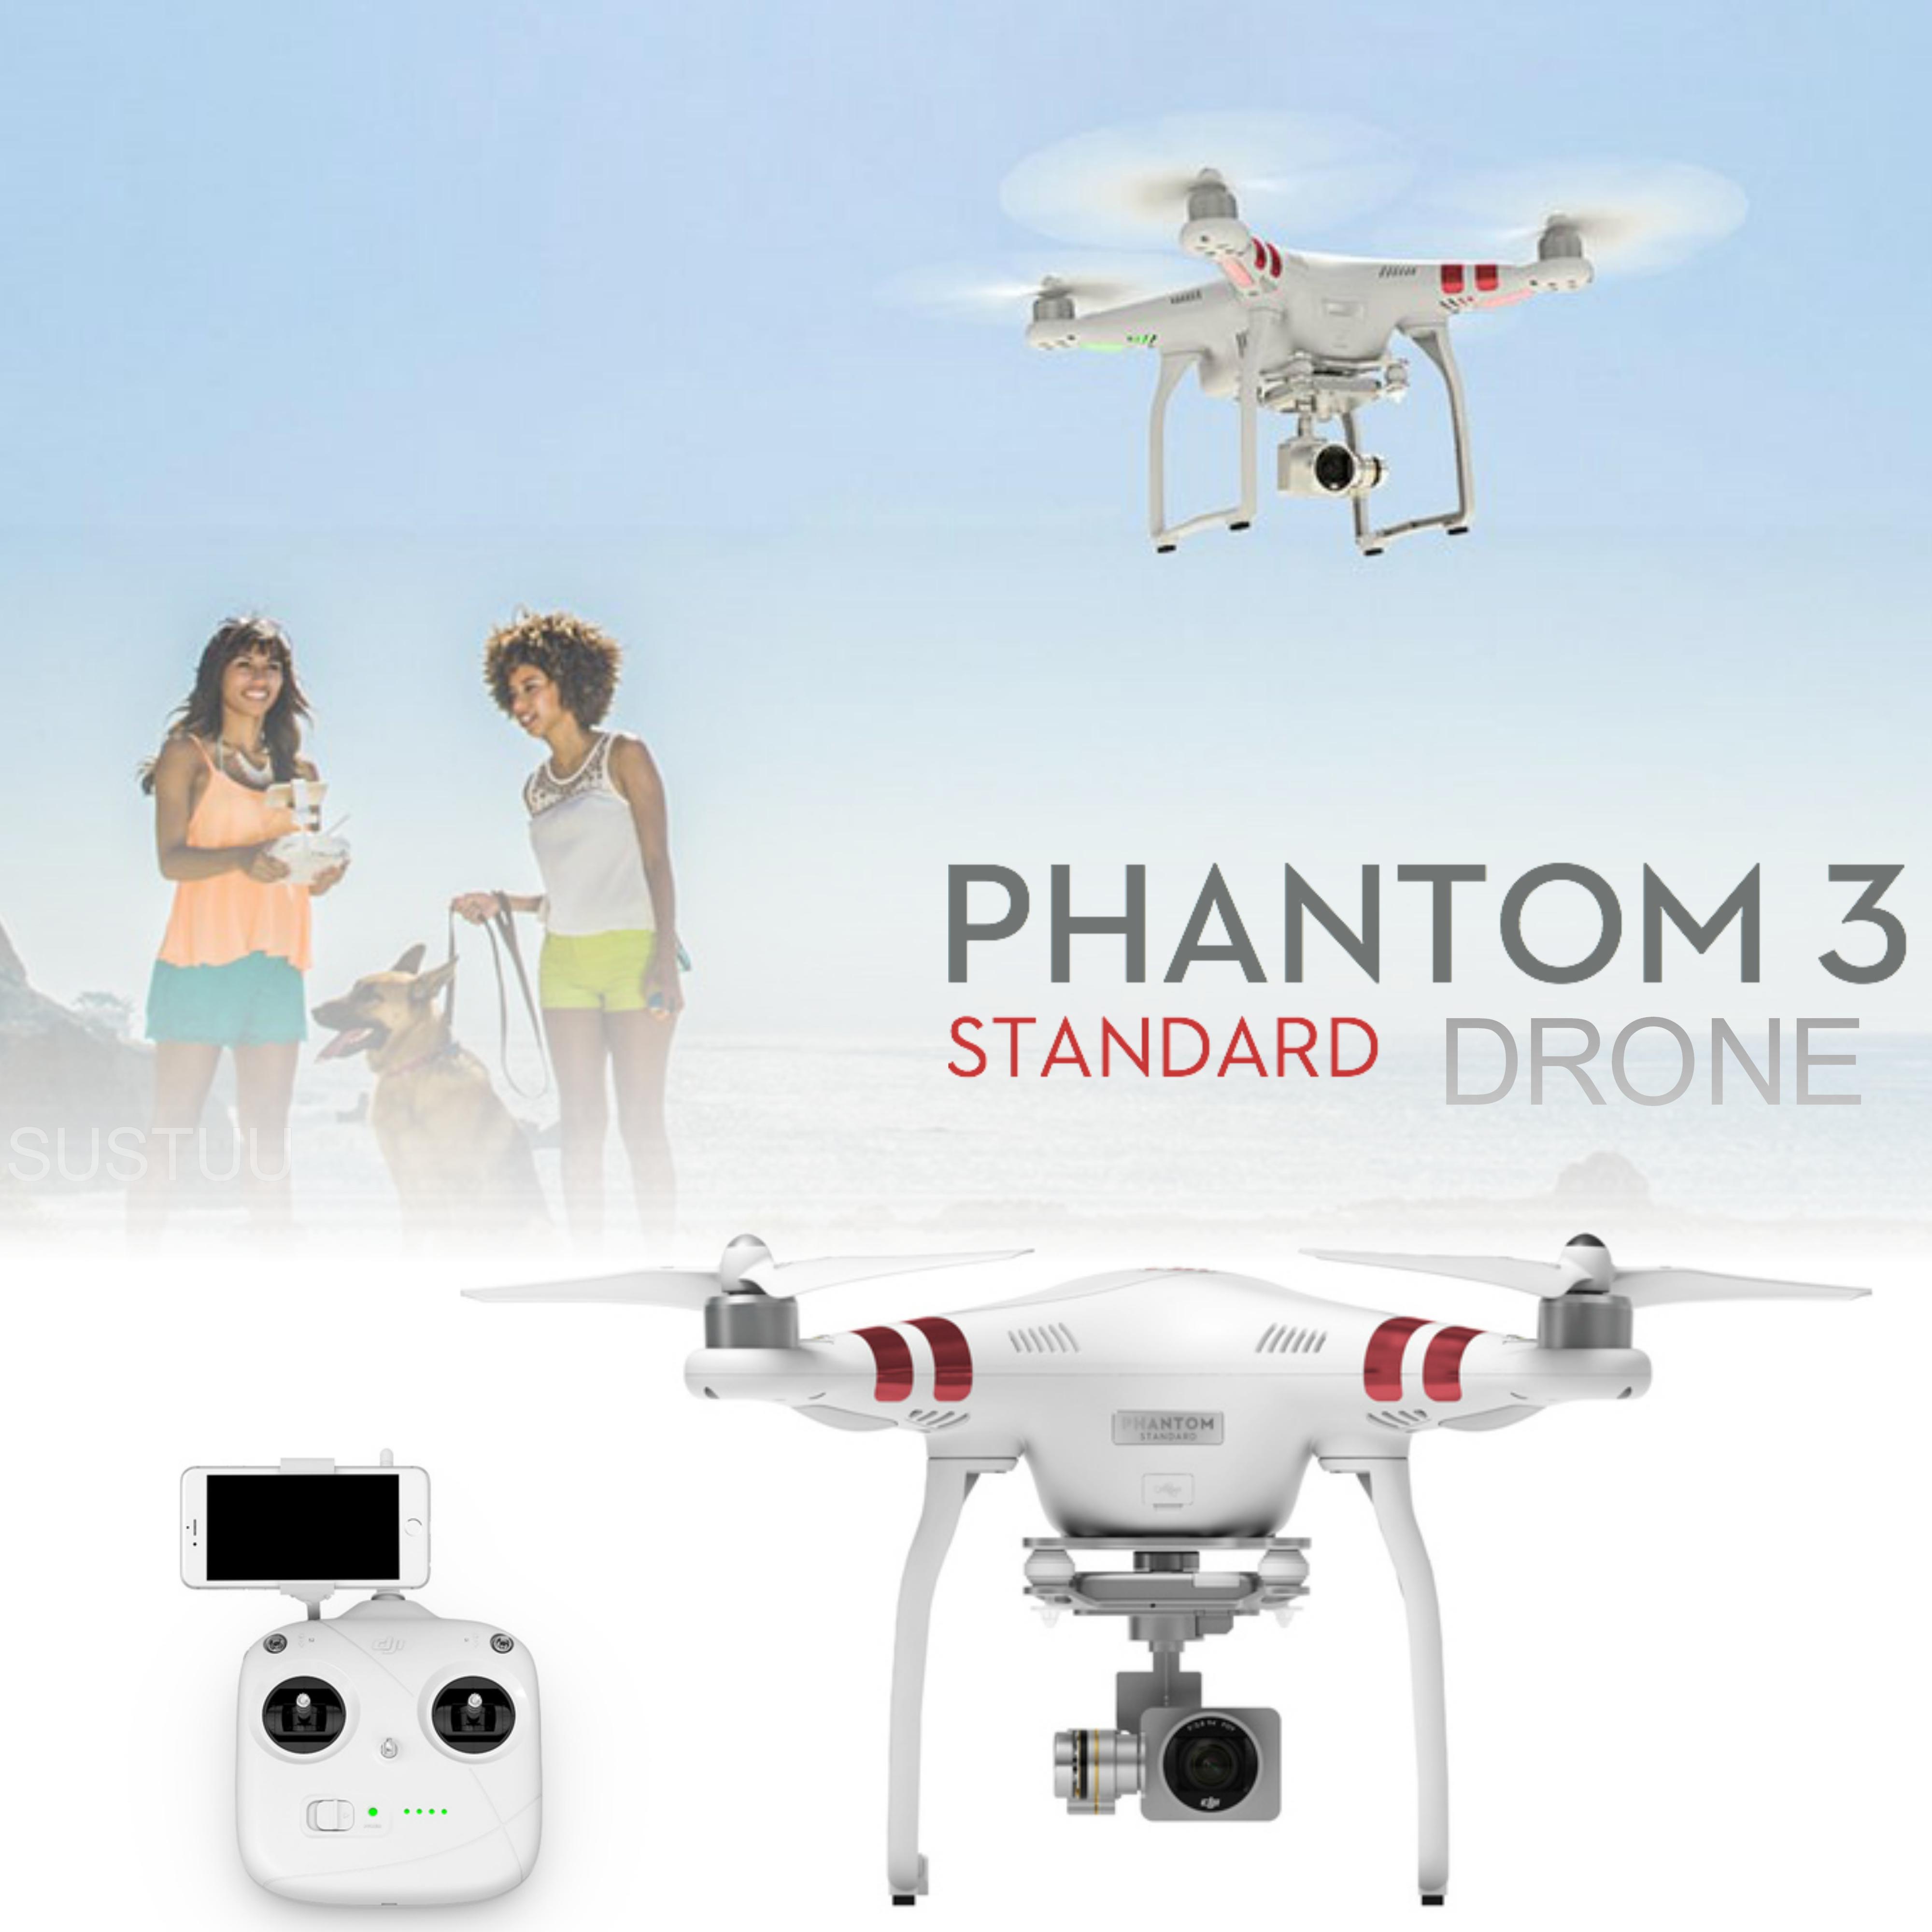 DJI Phantom 3 Standard Drone|12 MP 2.7K HD Video Camera|GPS Sender|CP.PT.000167